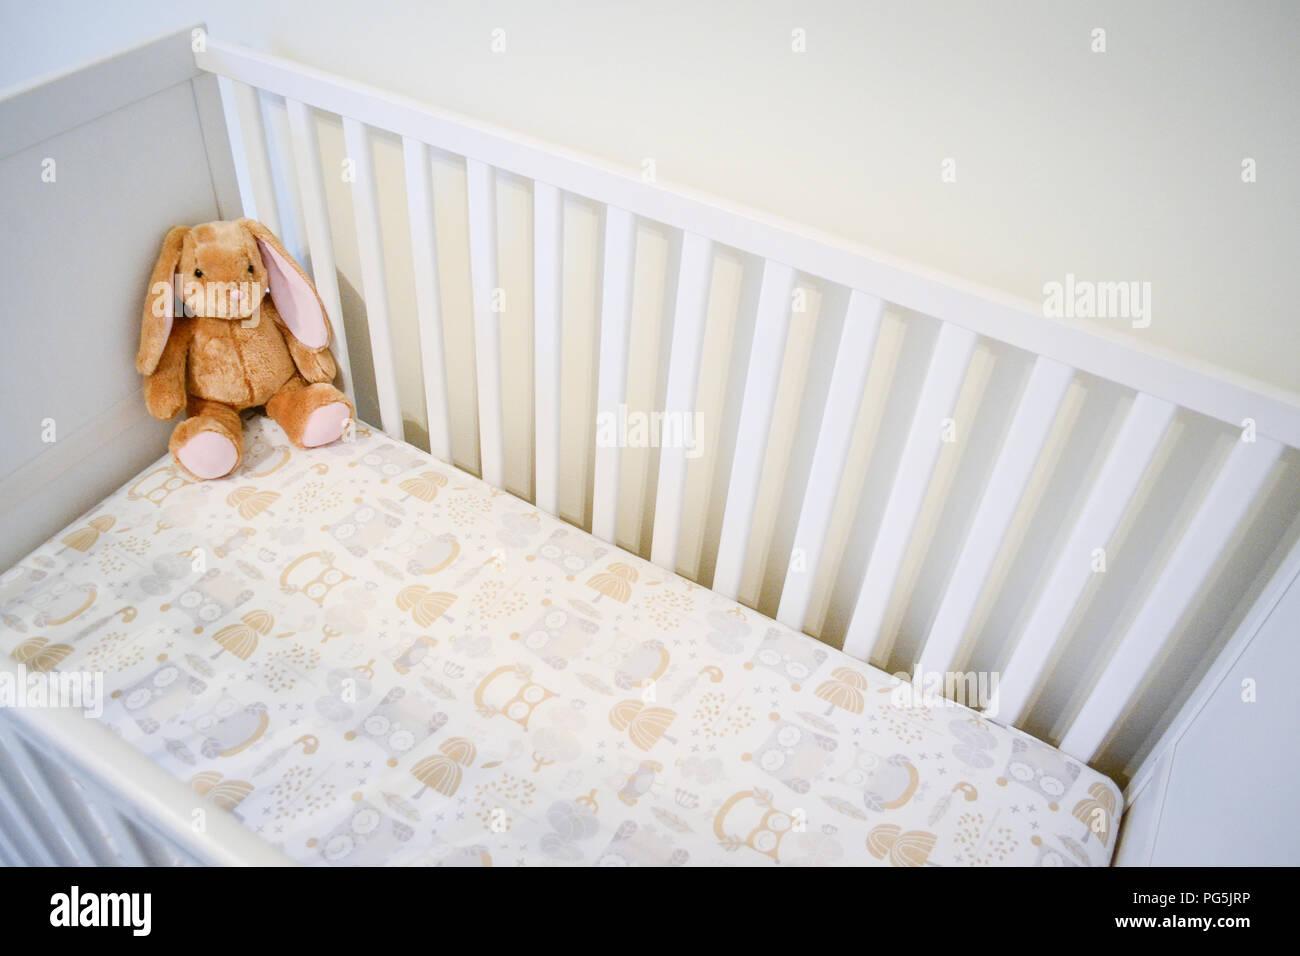 Ikea babybett laken kinderbett ikea biber spannbettlaken ikea